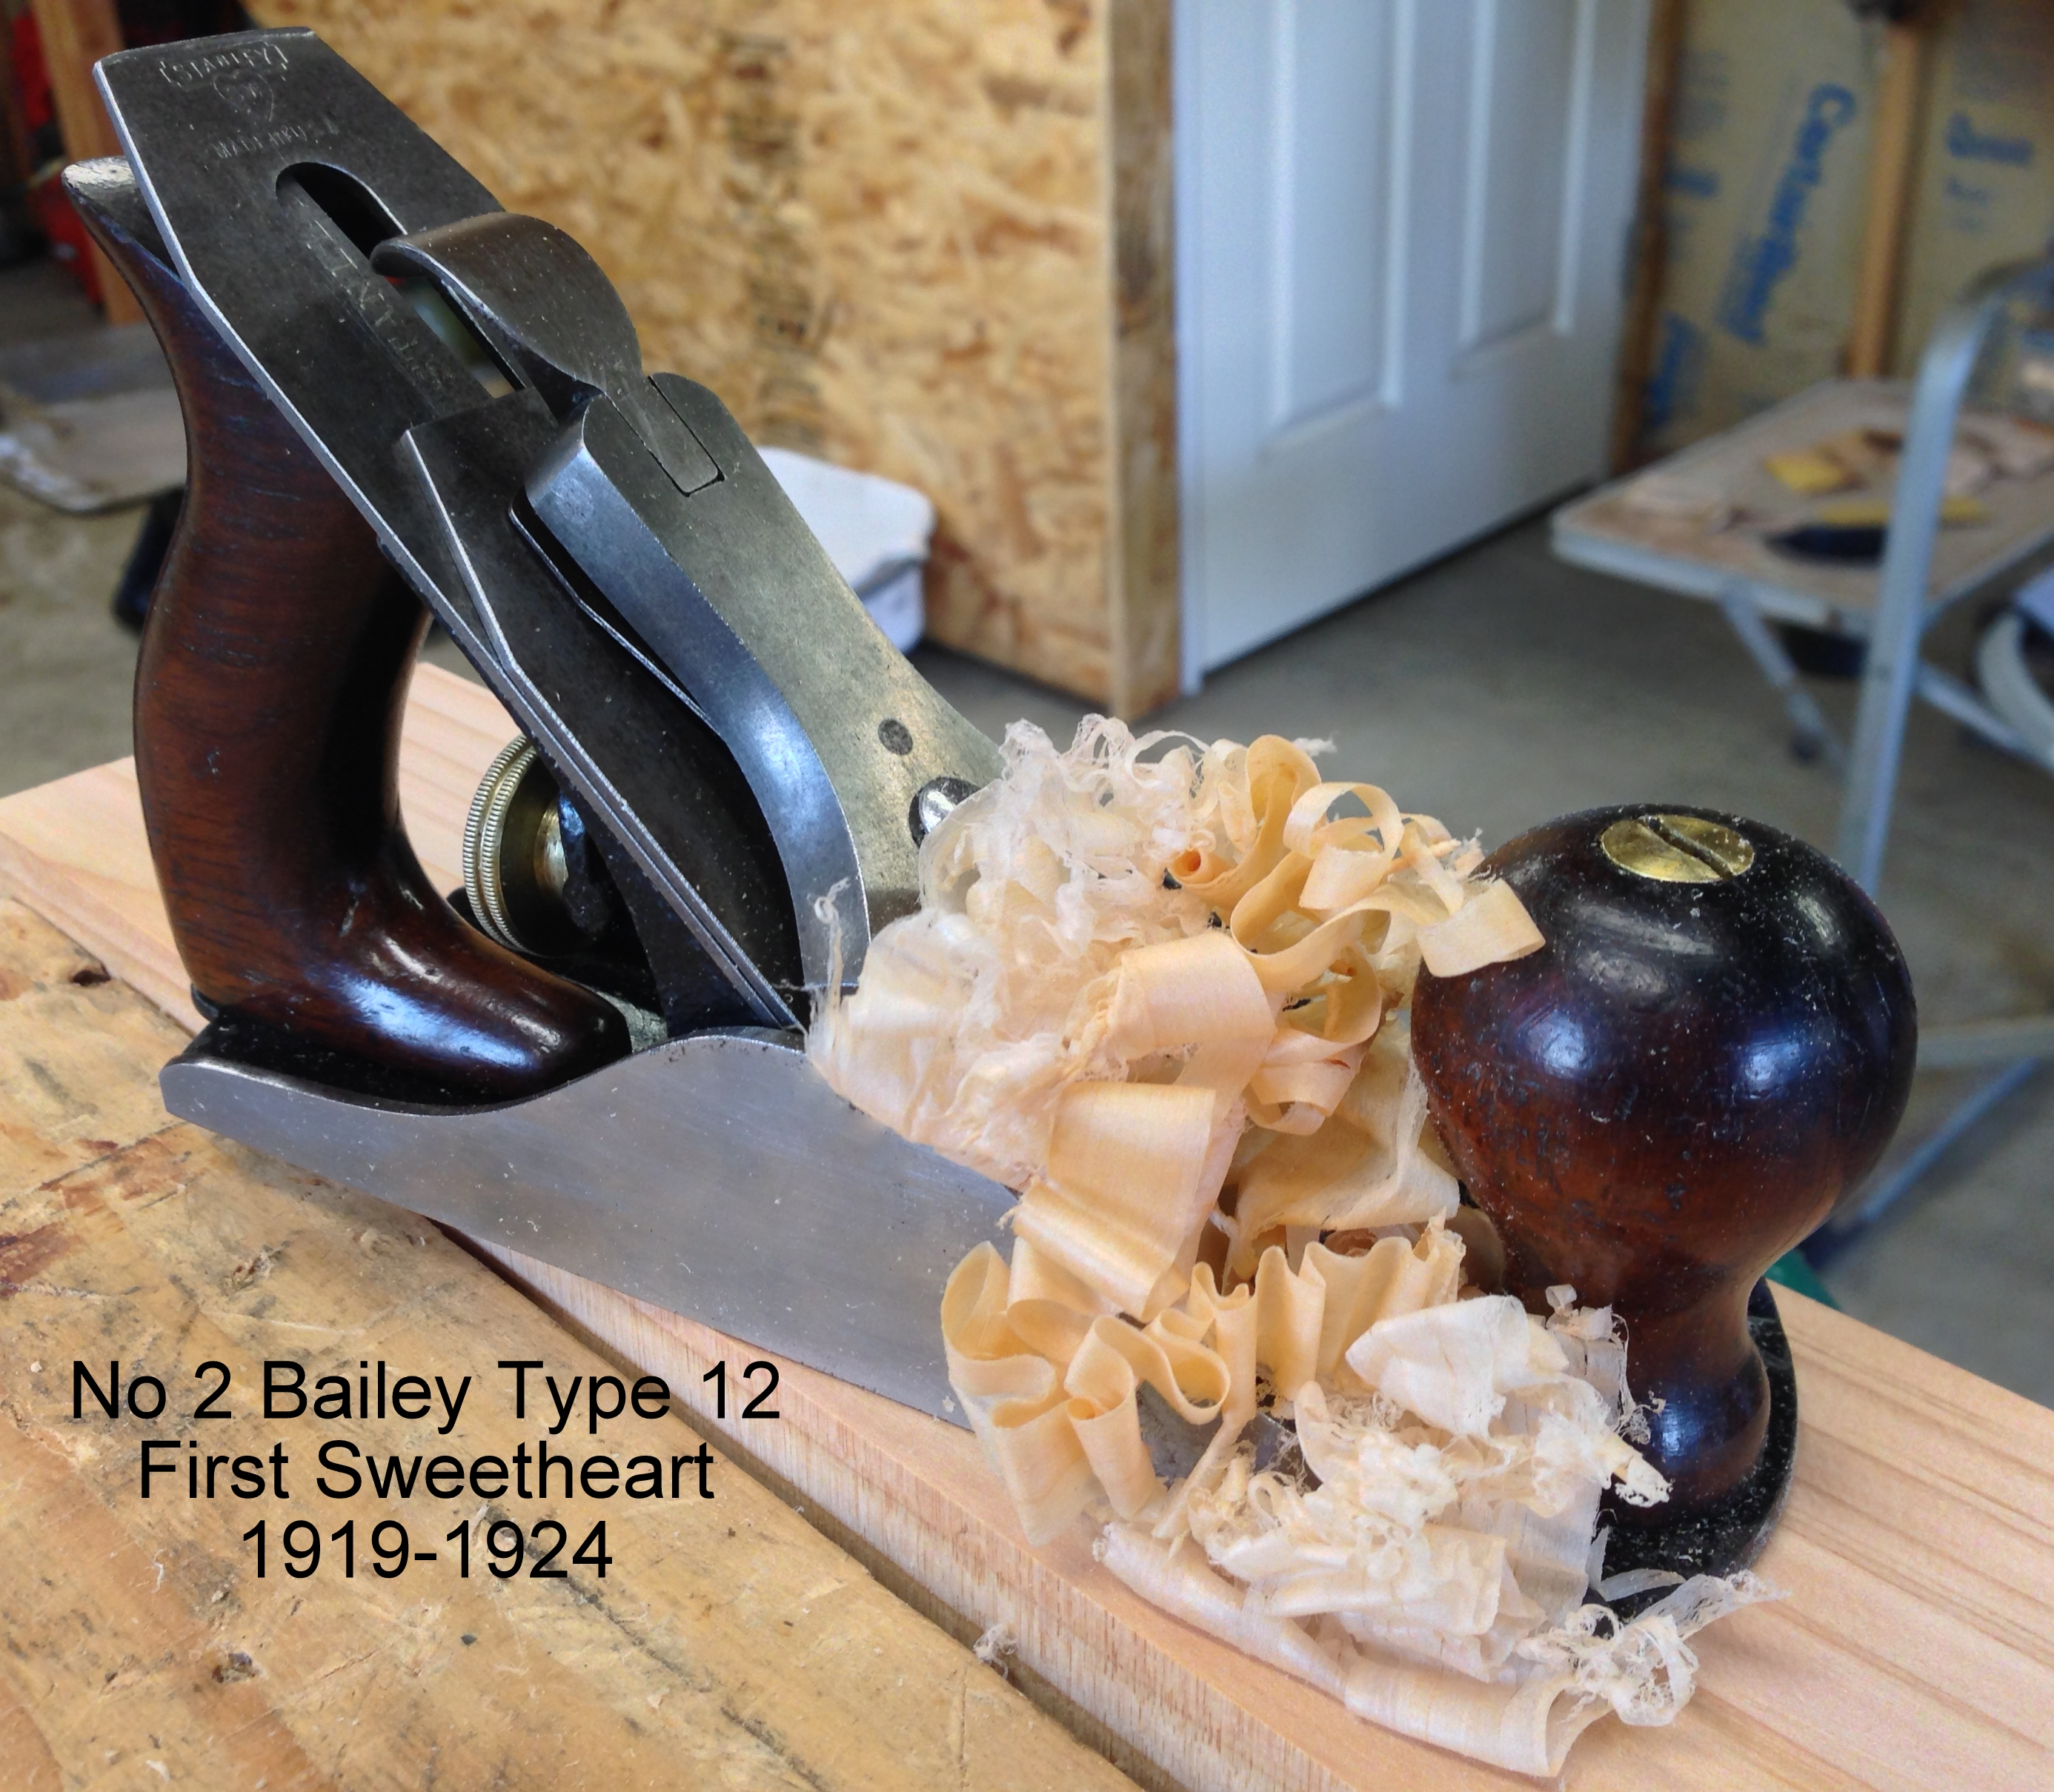 Bailey No 2 type 12